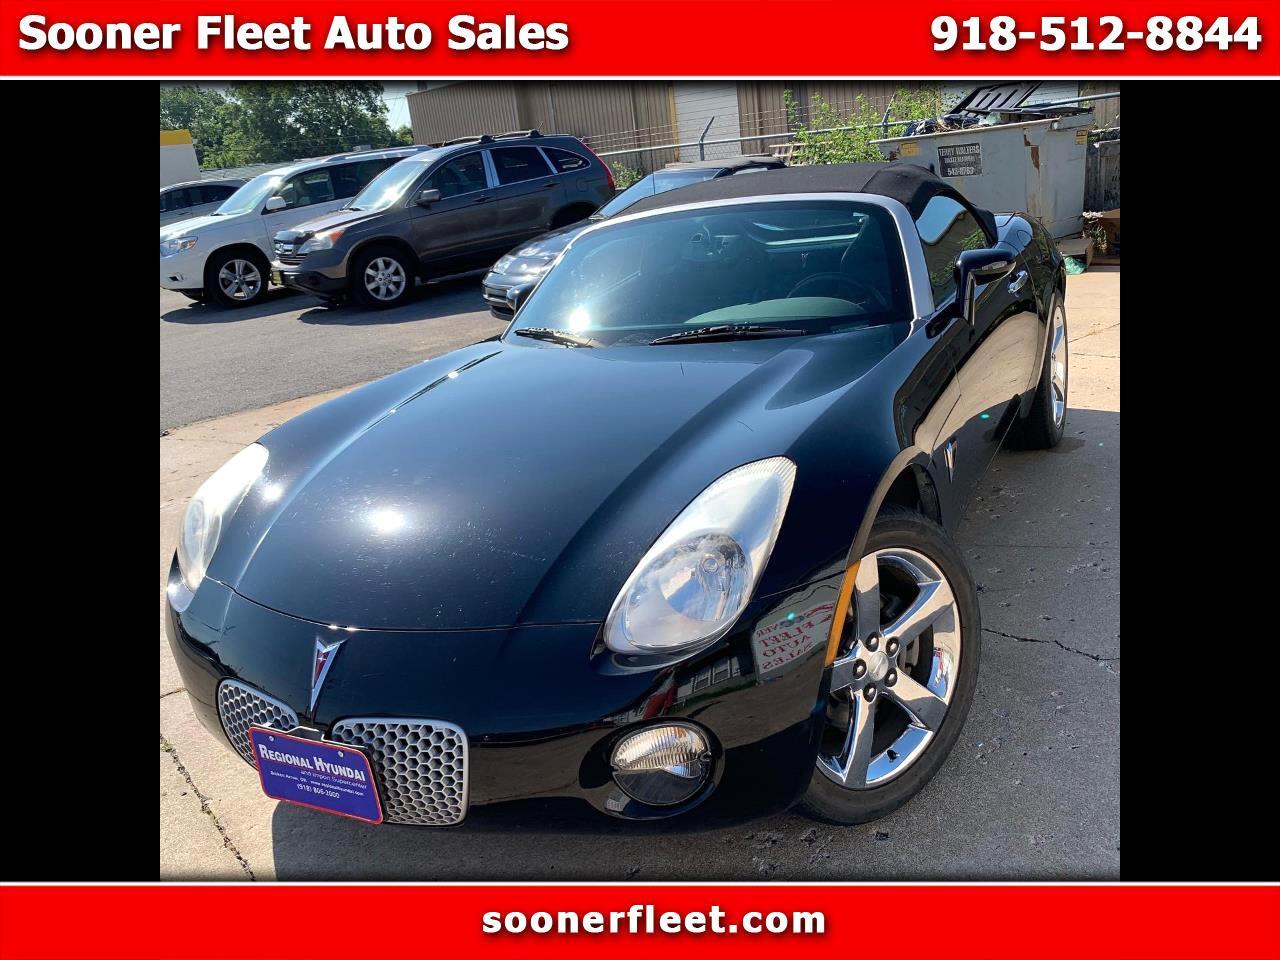 Pontiac Solstice 2dr Convertible 2007